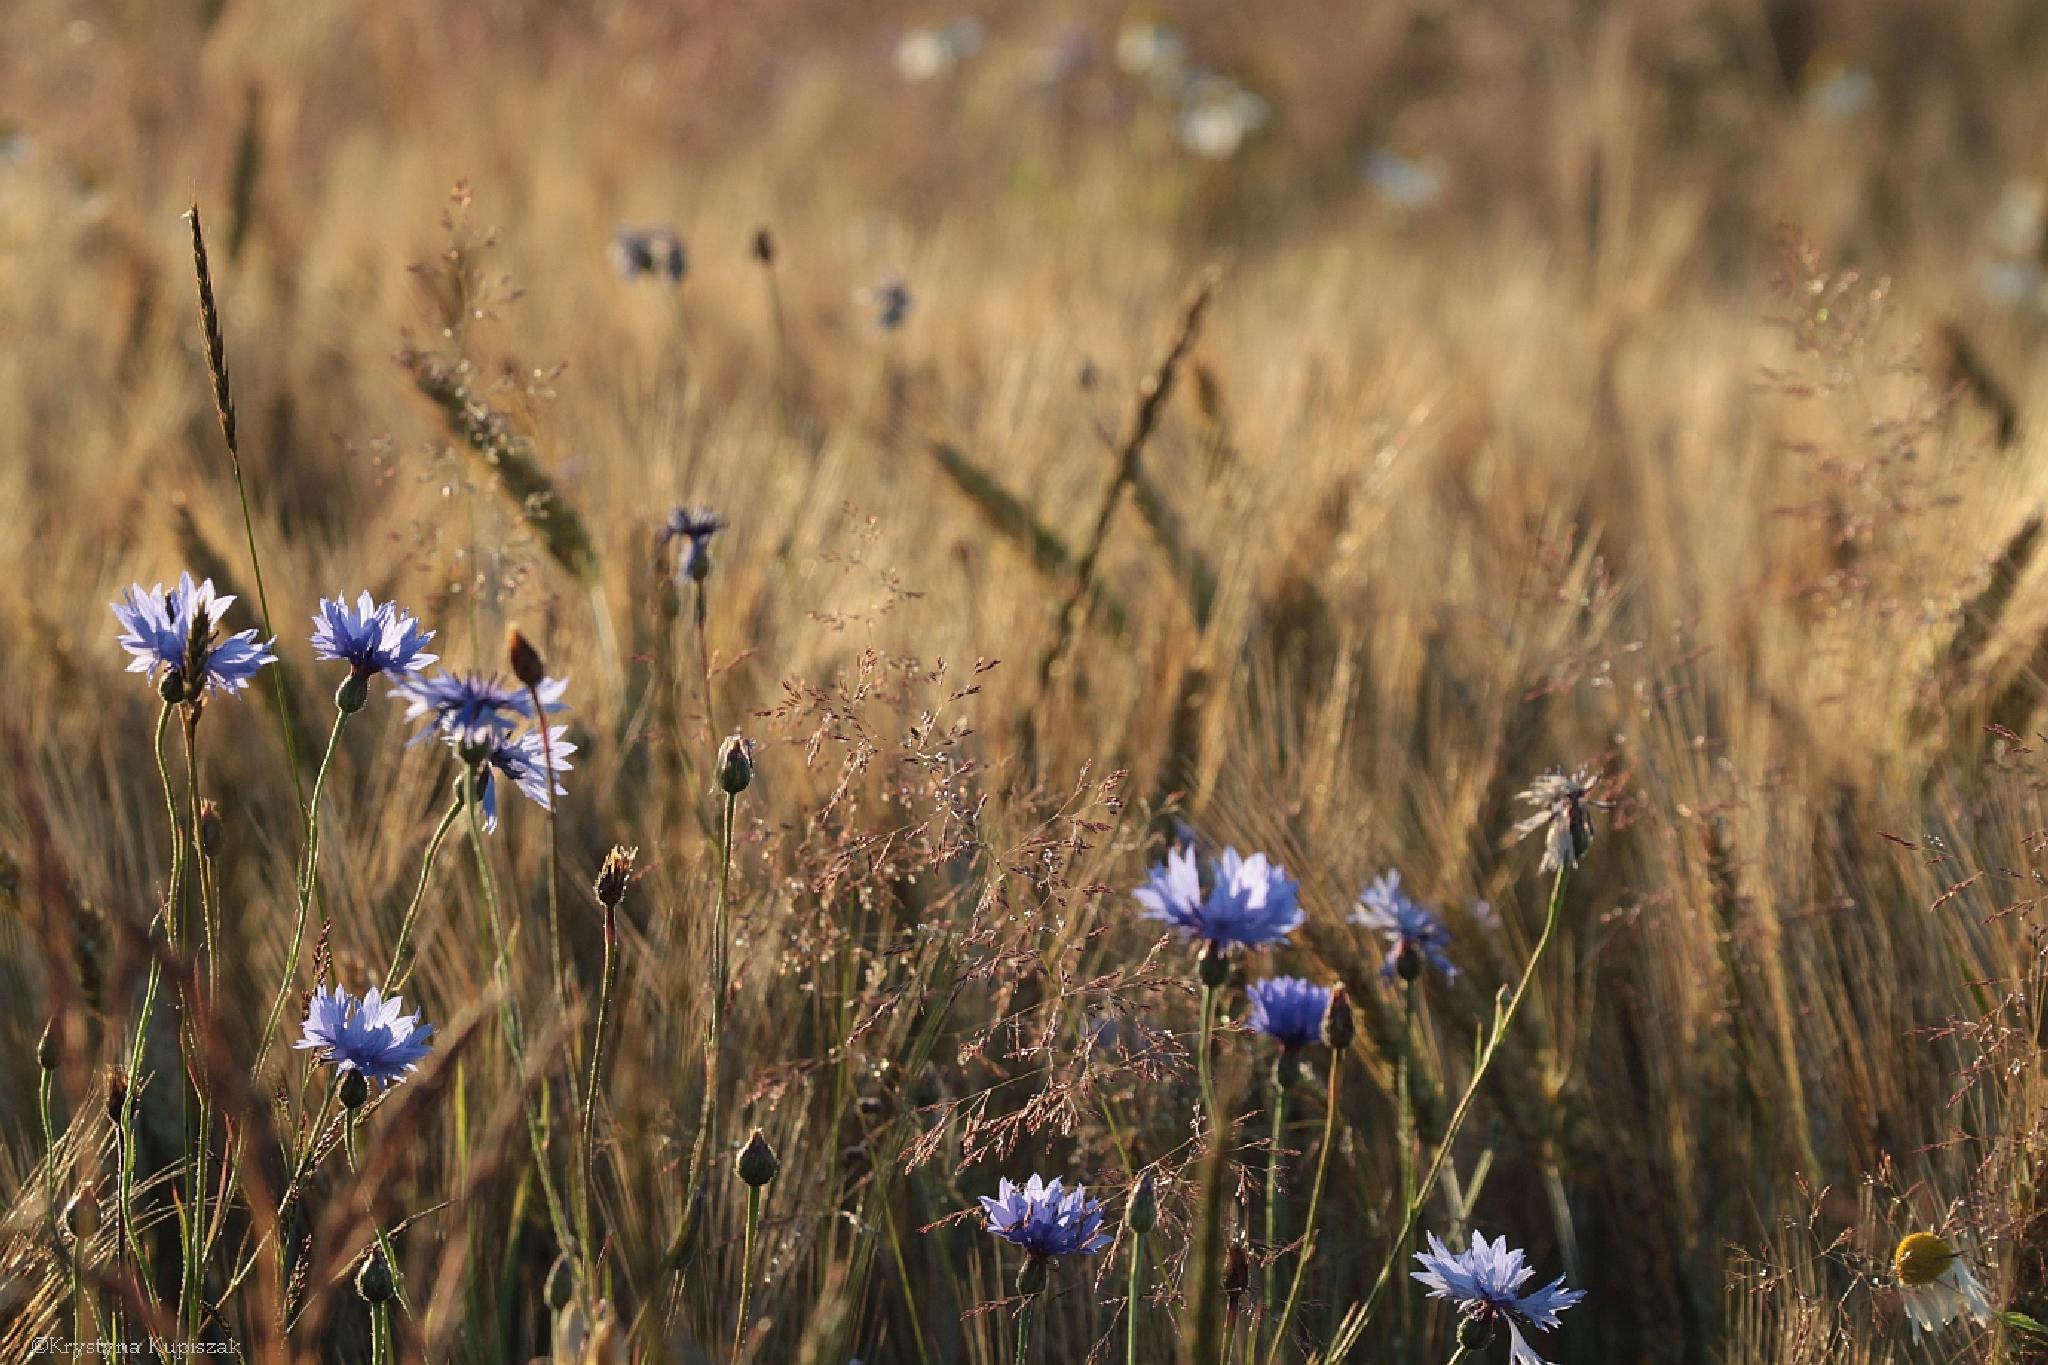 Summer fields by krystyna kupiszak